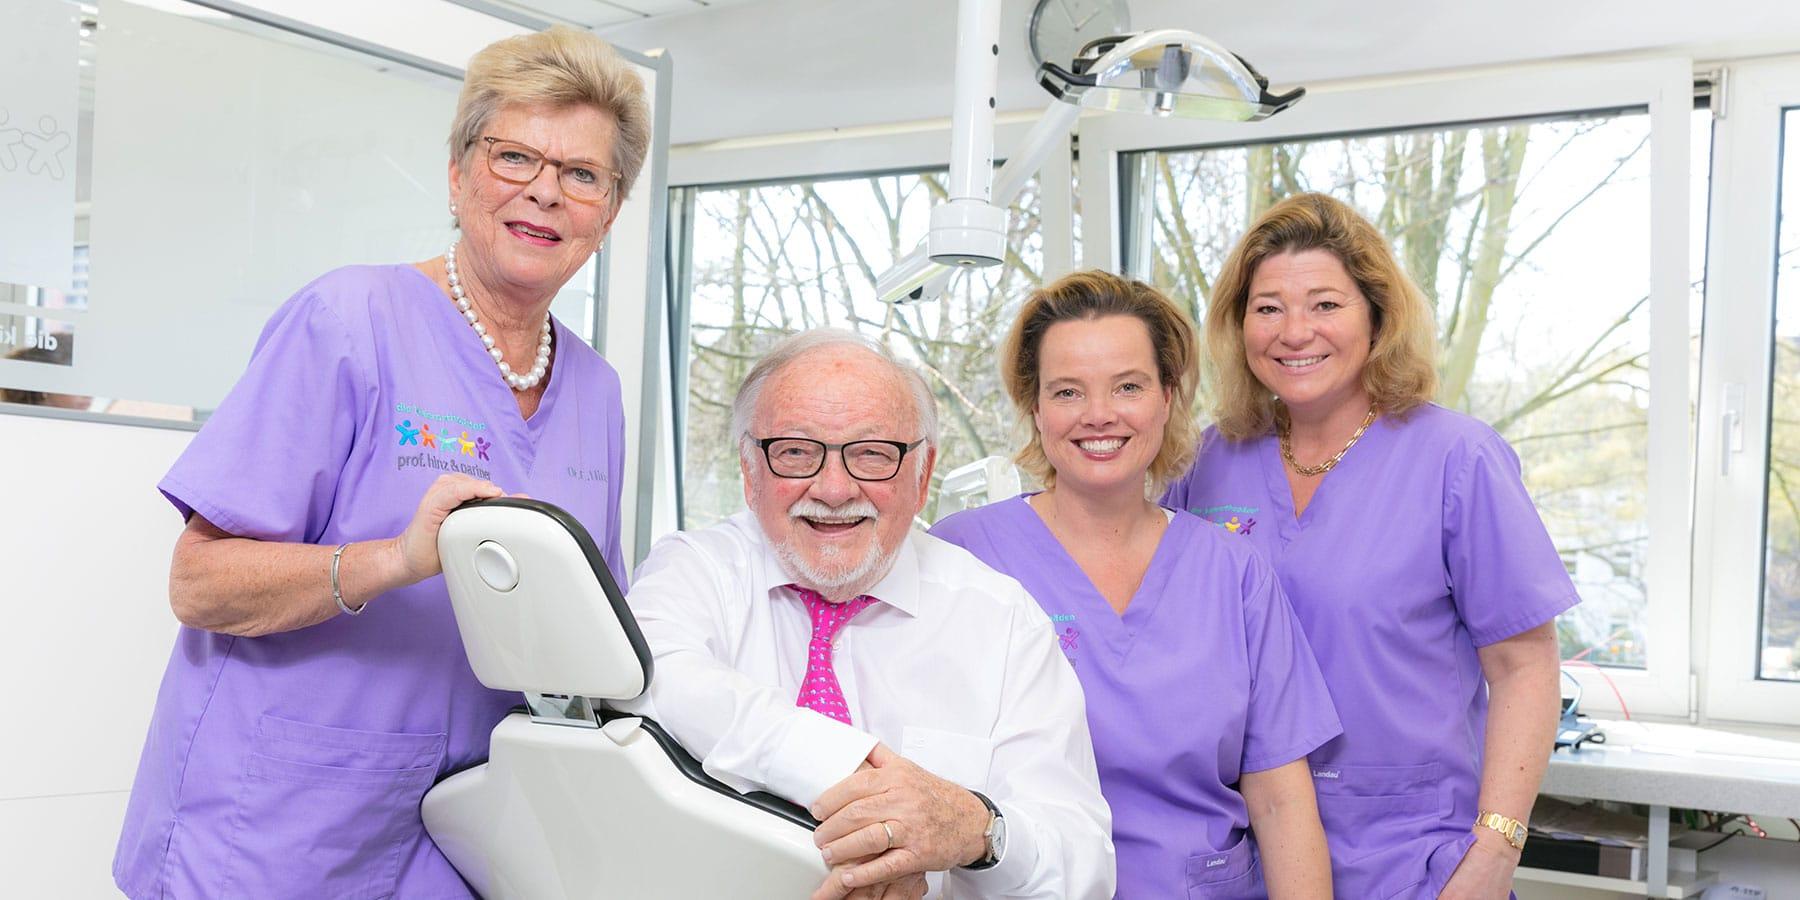 Ärzte der Praxis Prof. Hinz & Partner im Behandlungszimmer